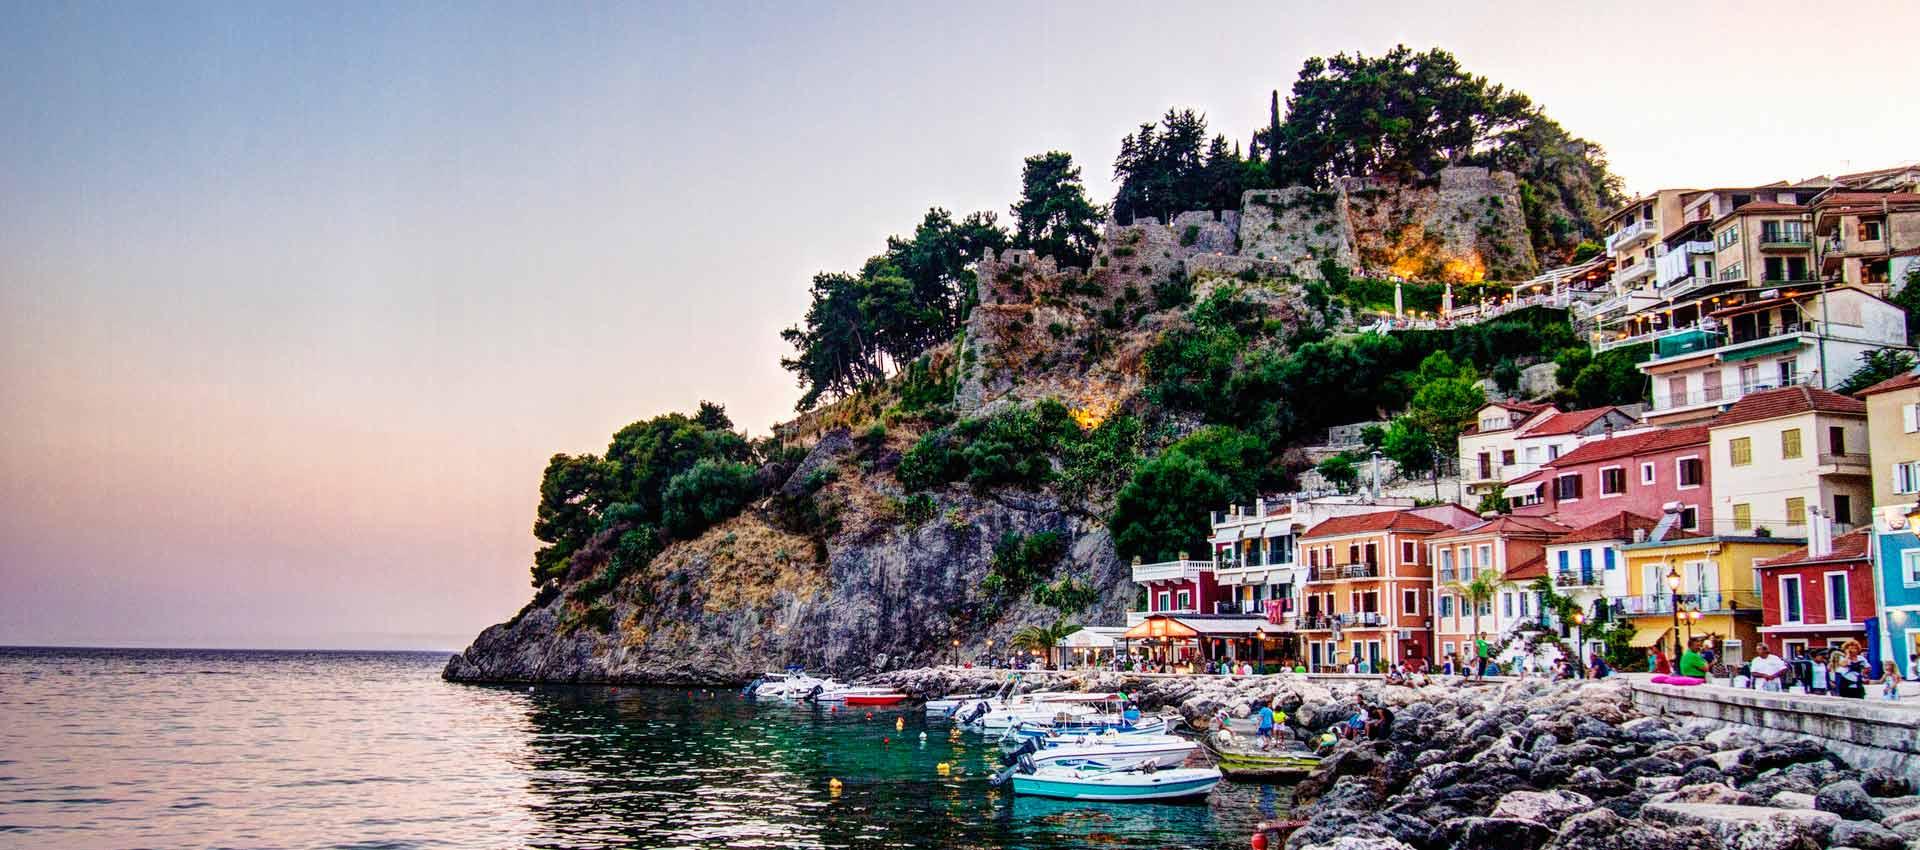 Parga, Greece | Ideal house in Parga